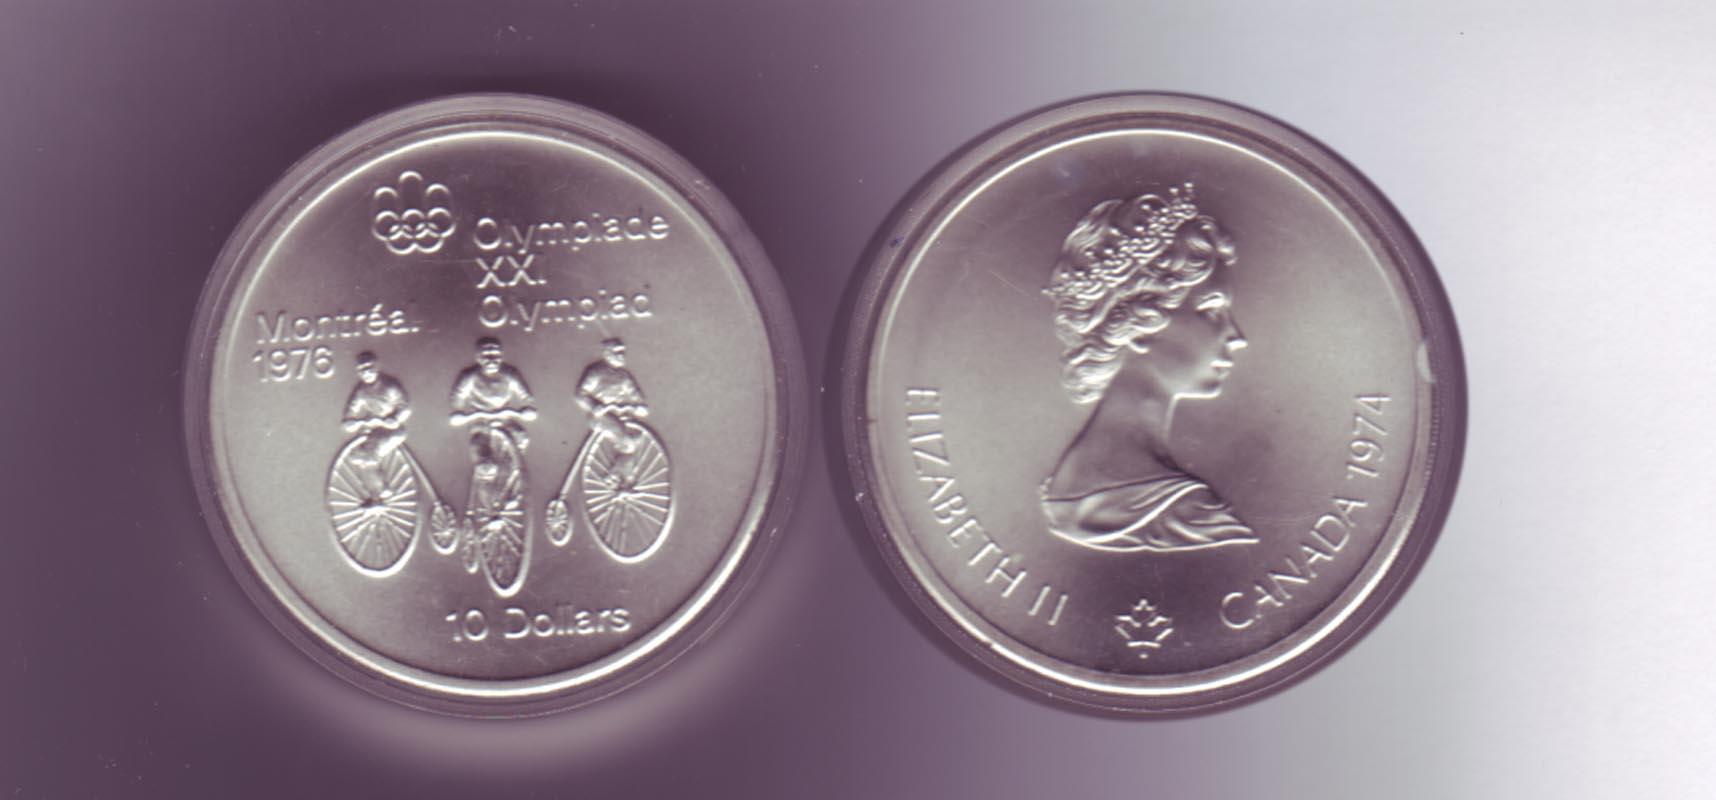 Silbermünze Kanada 10 Dollars Olympiade Montreal 1976 Radfahrer